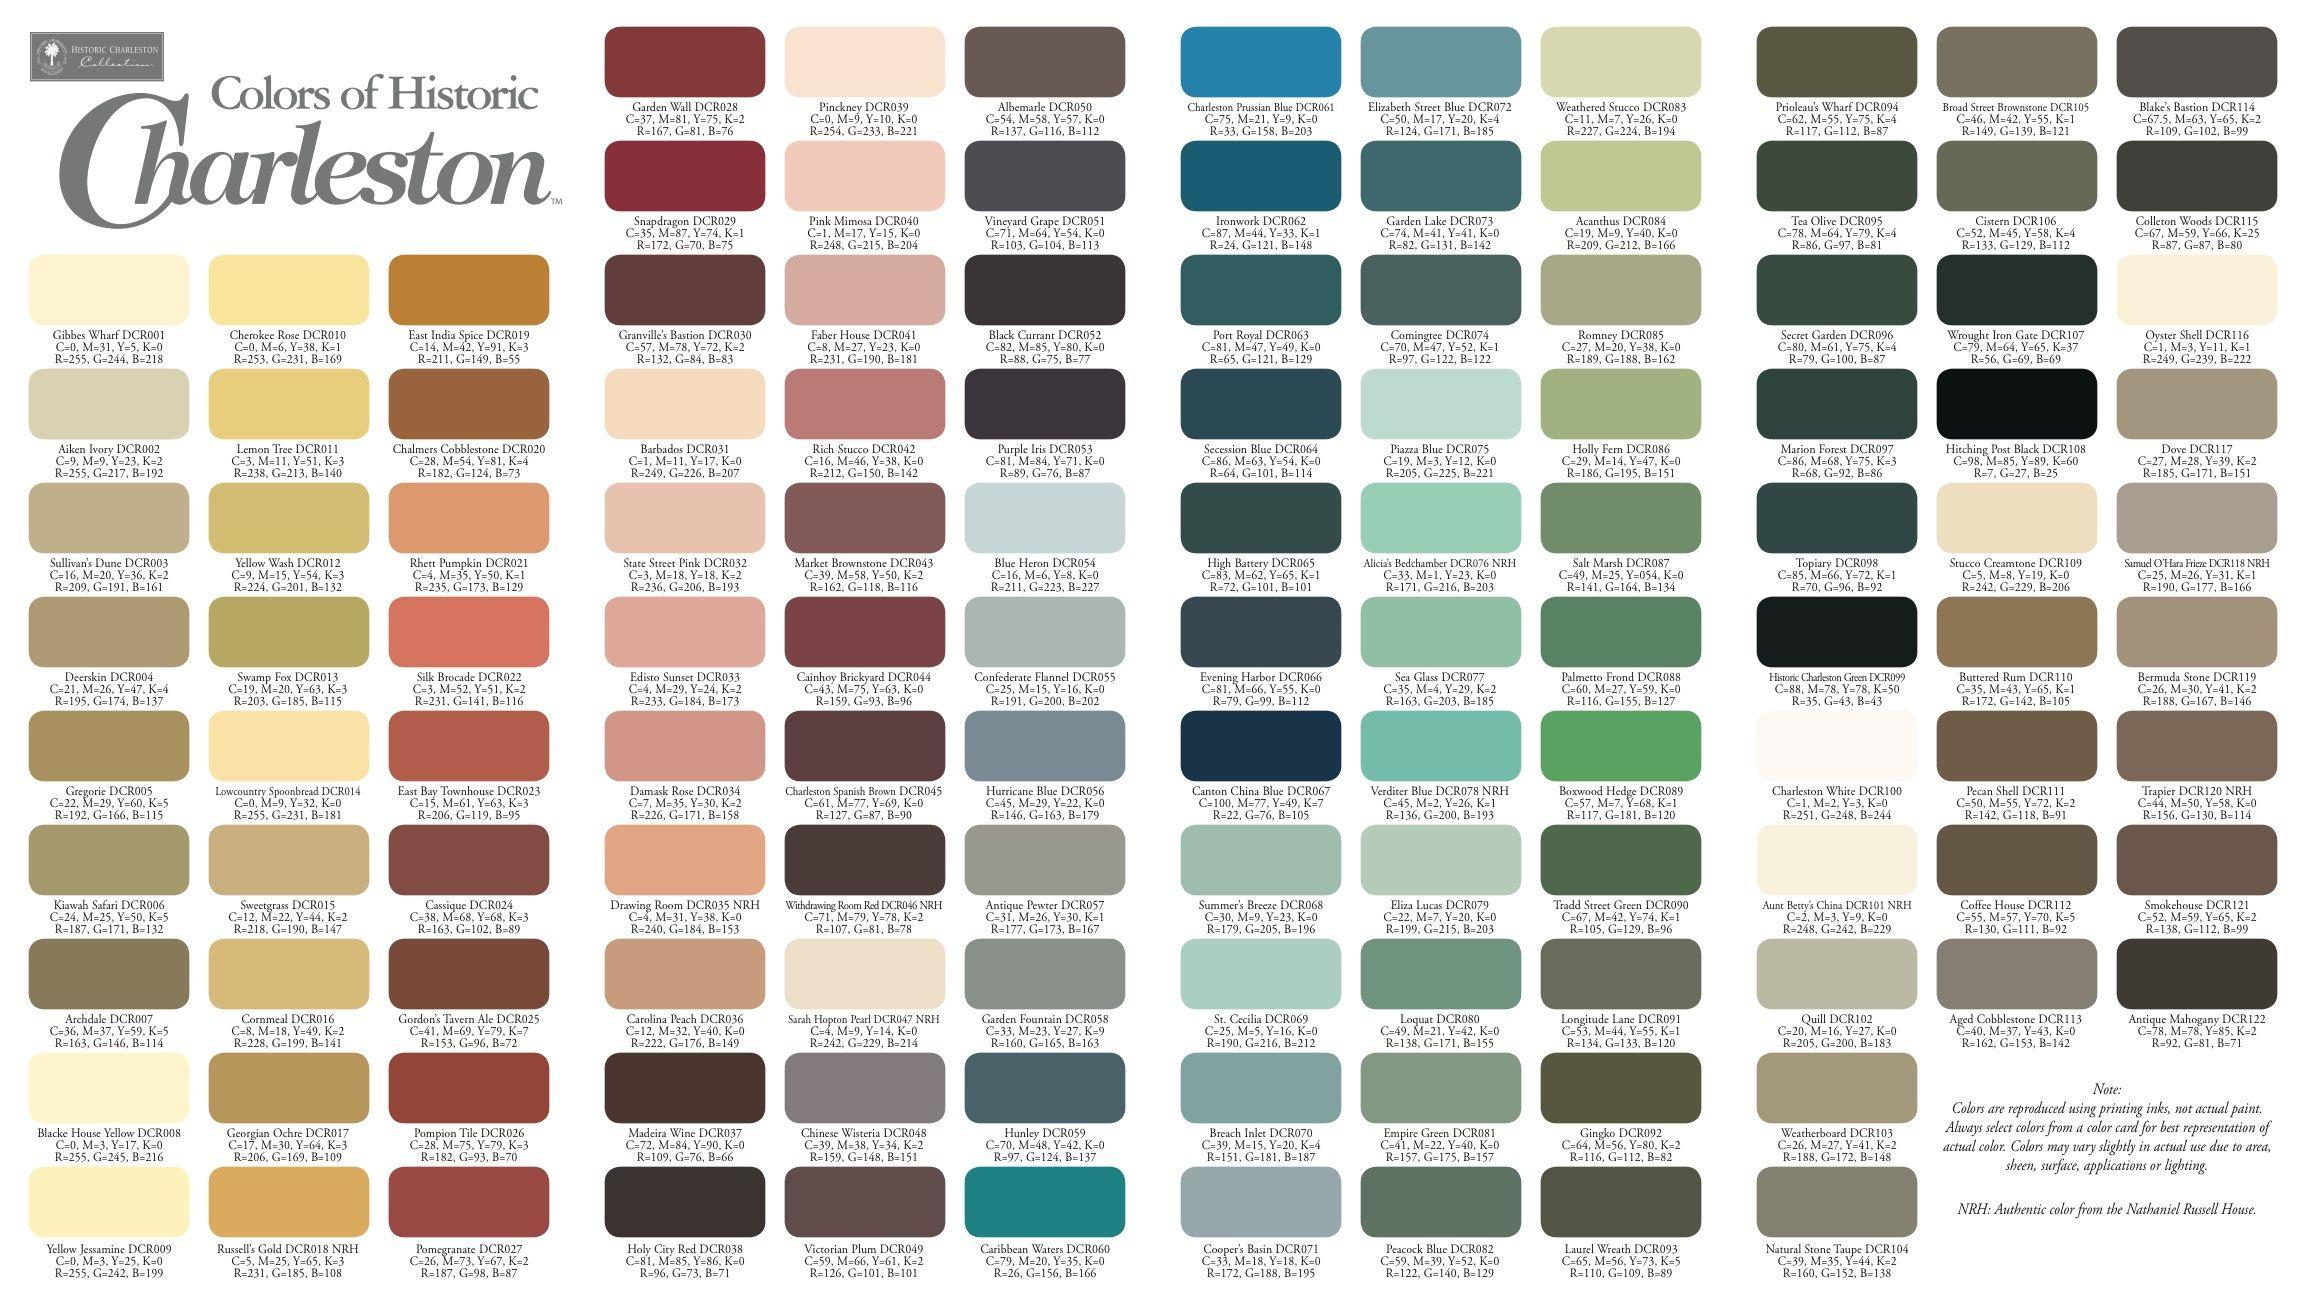 Colors Of Historic Charleston Historic Paint Colours Historic Paint Sherwin Williams Colors